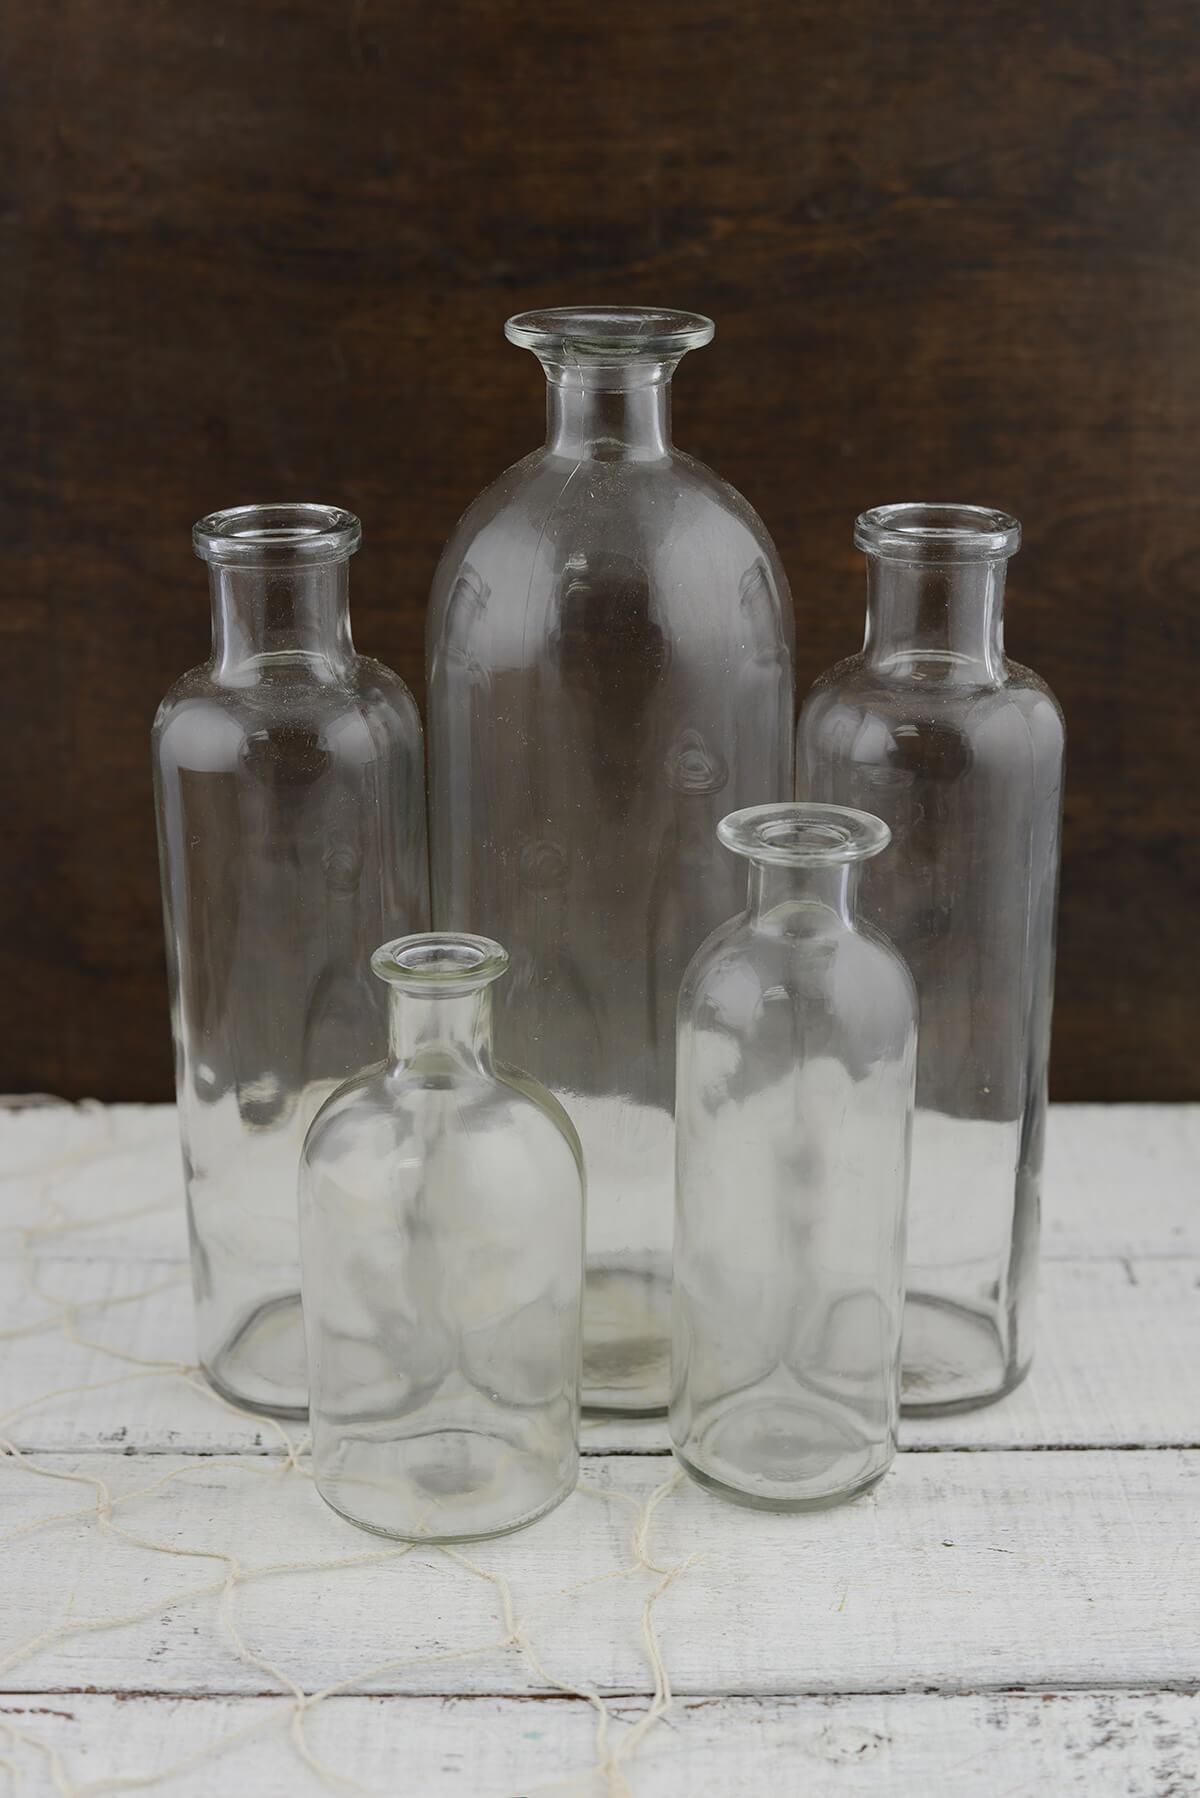 5 Glass Bottle Vases w/Tray 16in